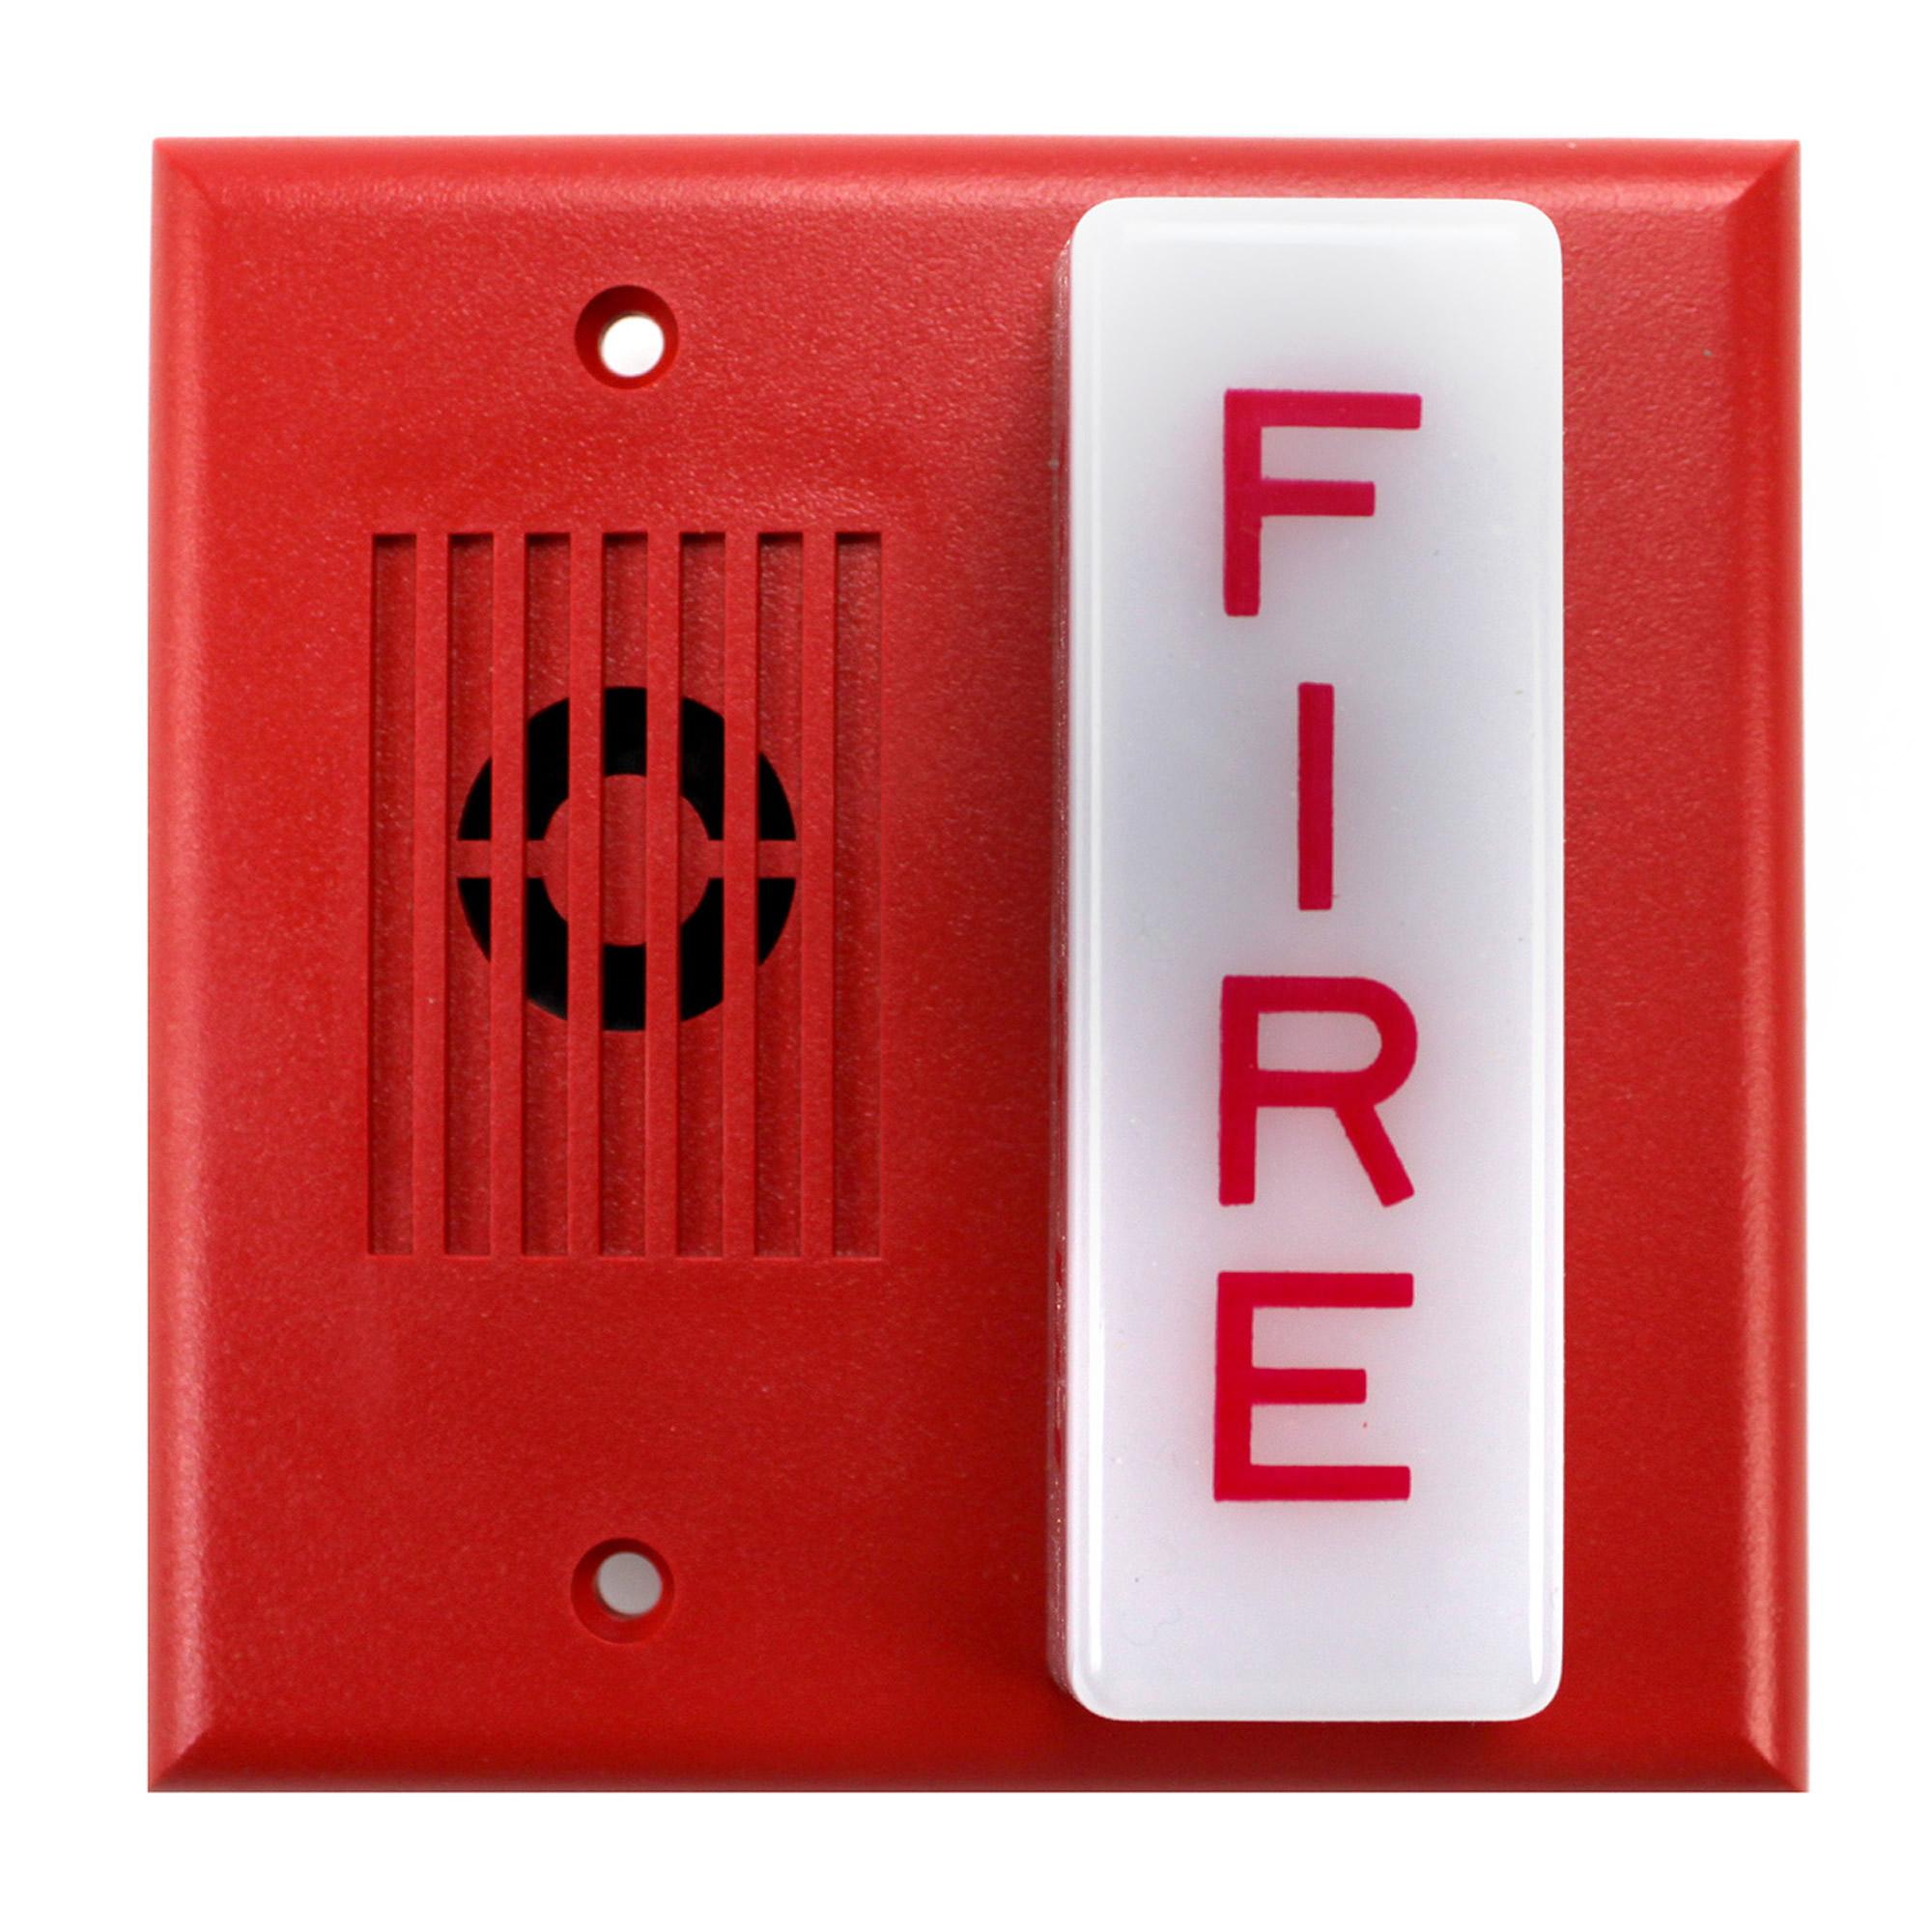 WHEELOCK MT-24-LSM-VFR HORN STROBE MULTITONE (RED) P/N ...  |Wheelock Fire Alarm Horn Strobe